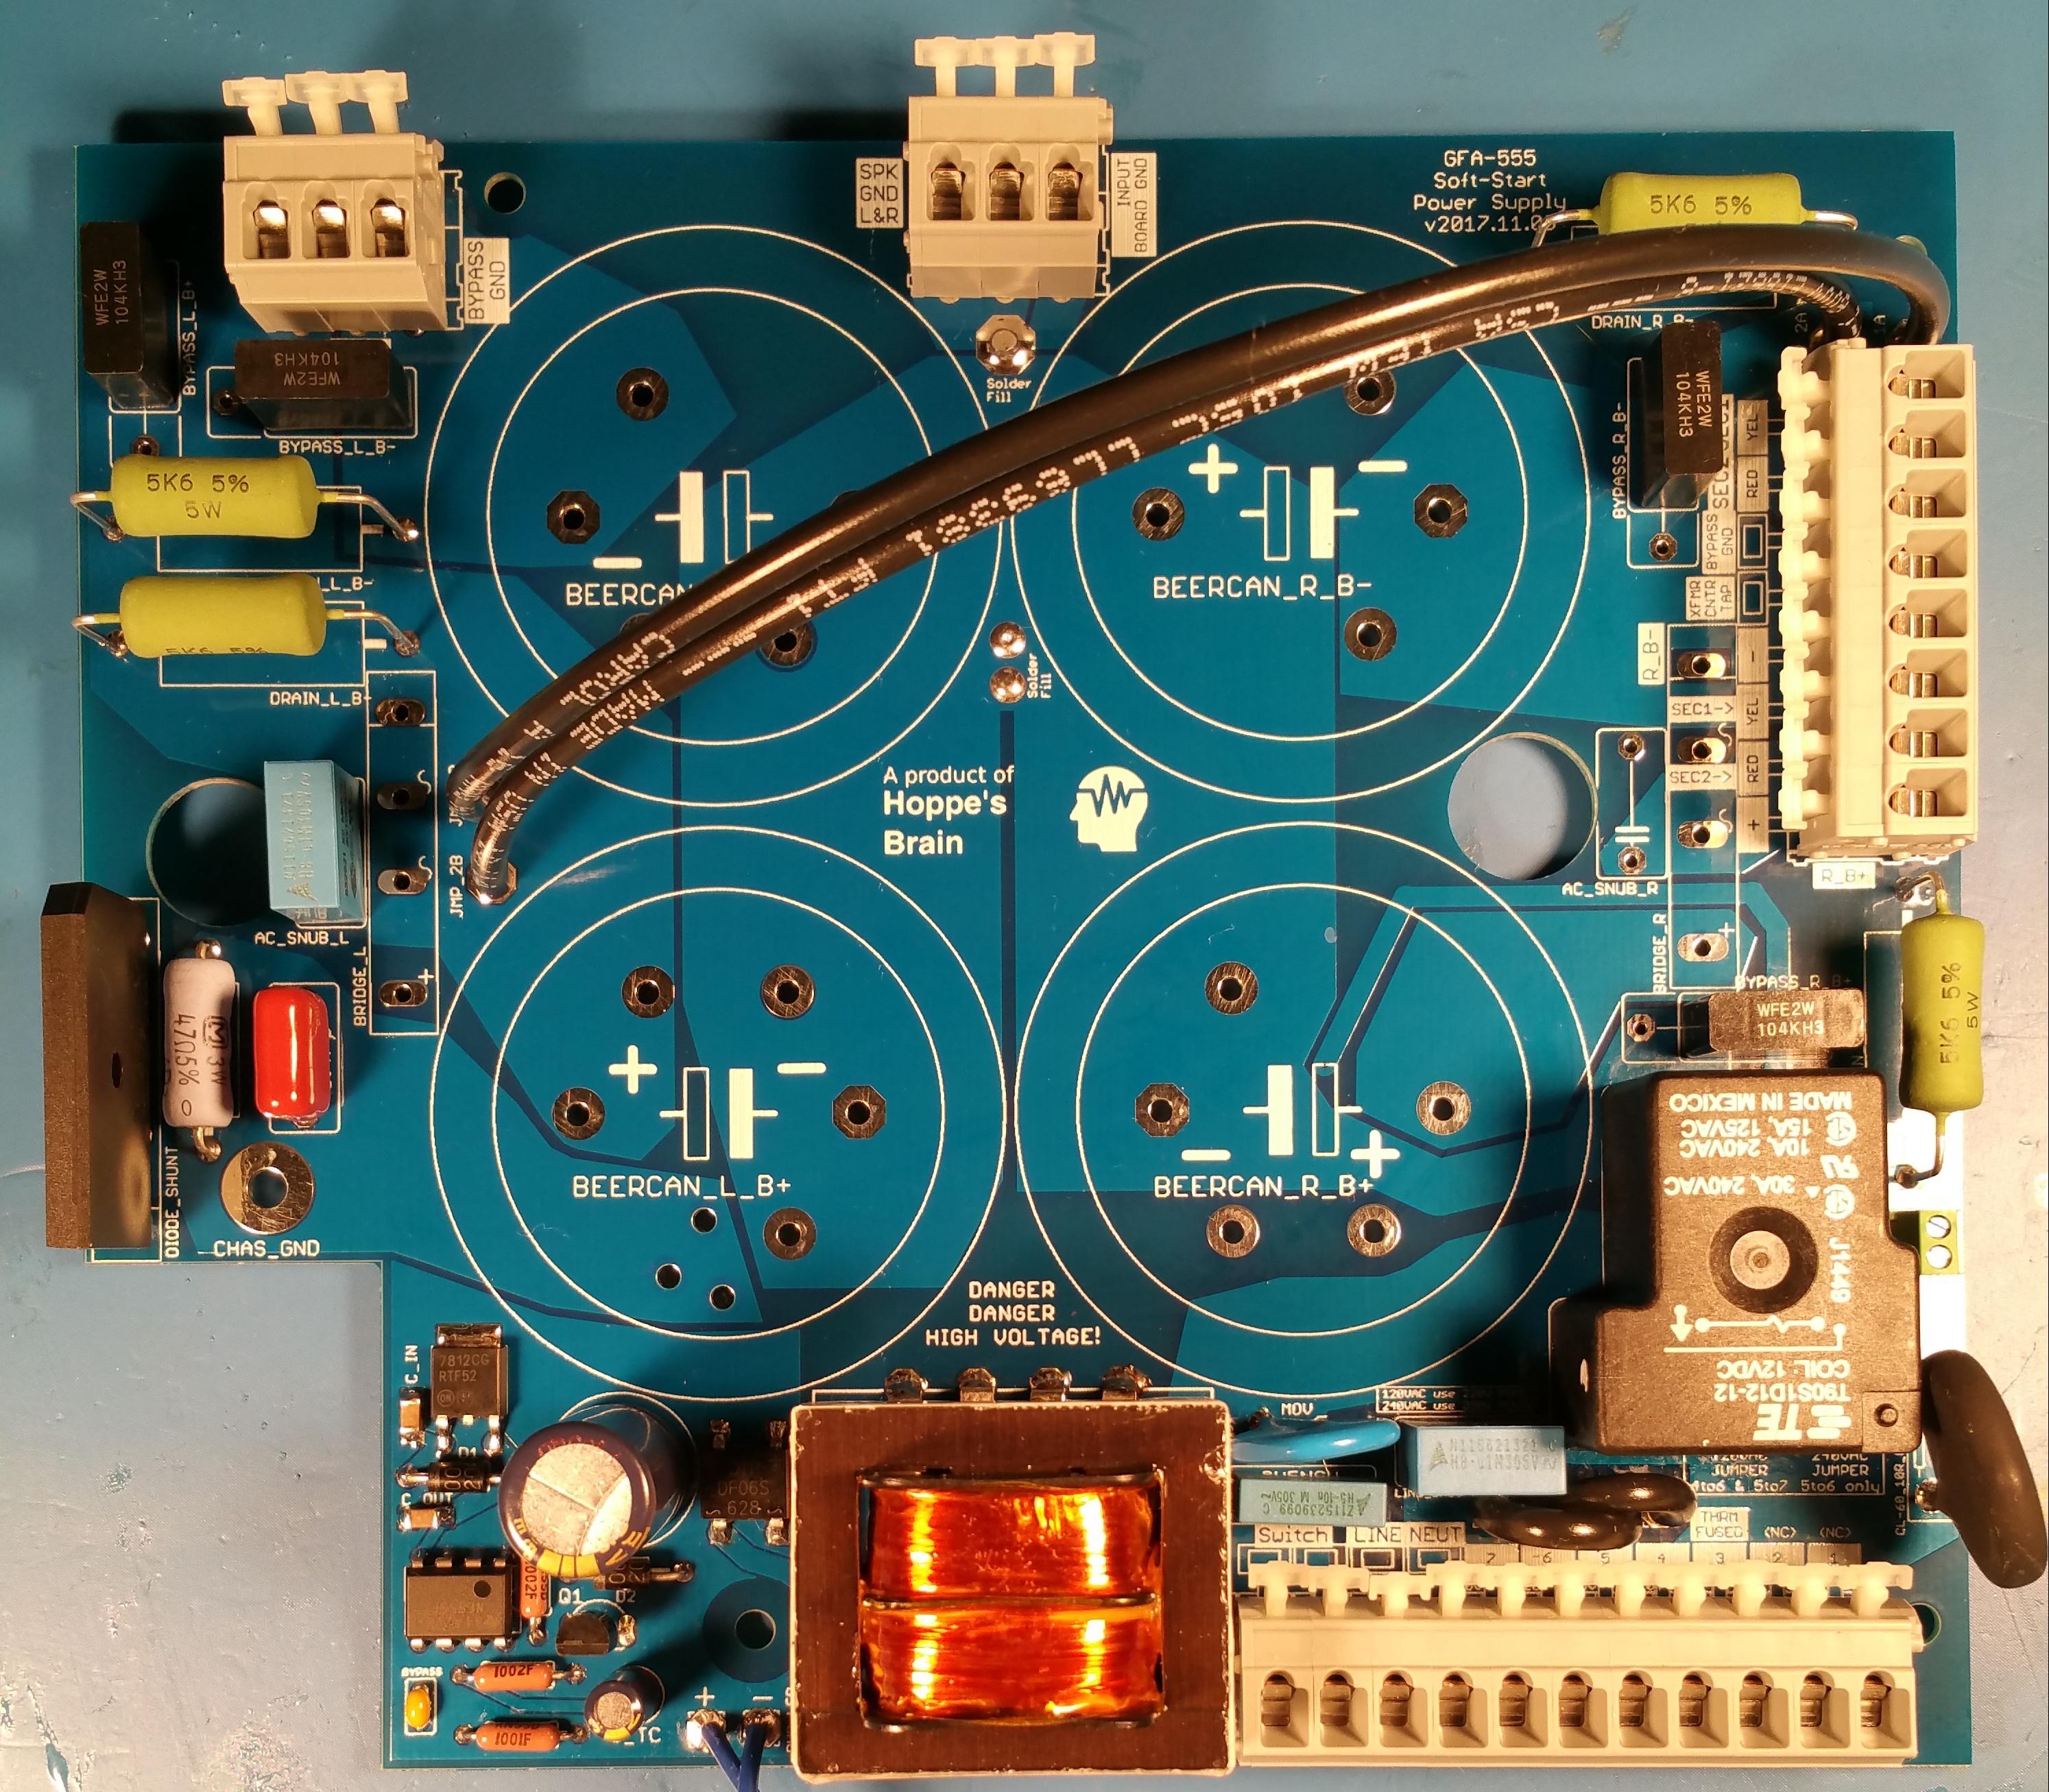 Adcom Gfa 555 Mk1 And Mk2 Soft Start Power Supply Upgrade Kit Isolation Regulated Circuit Of Ne555 Powersupply Available On Backorder